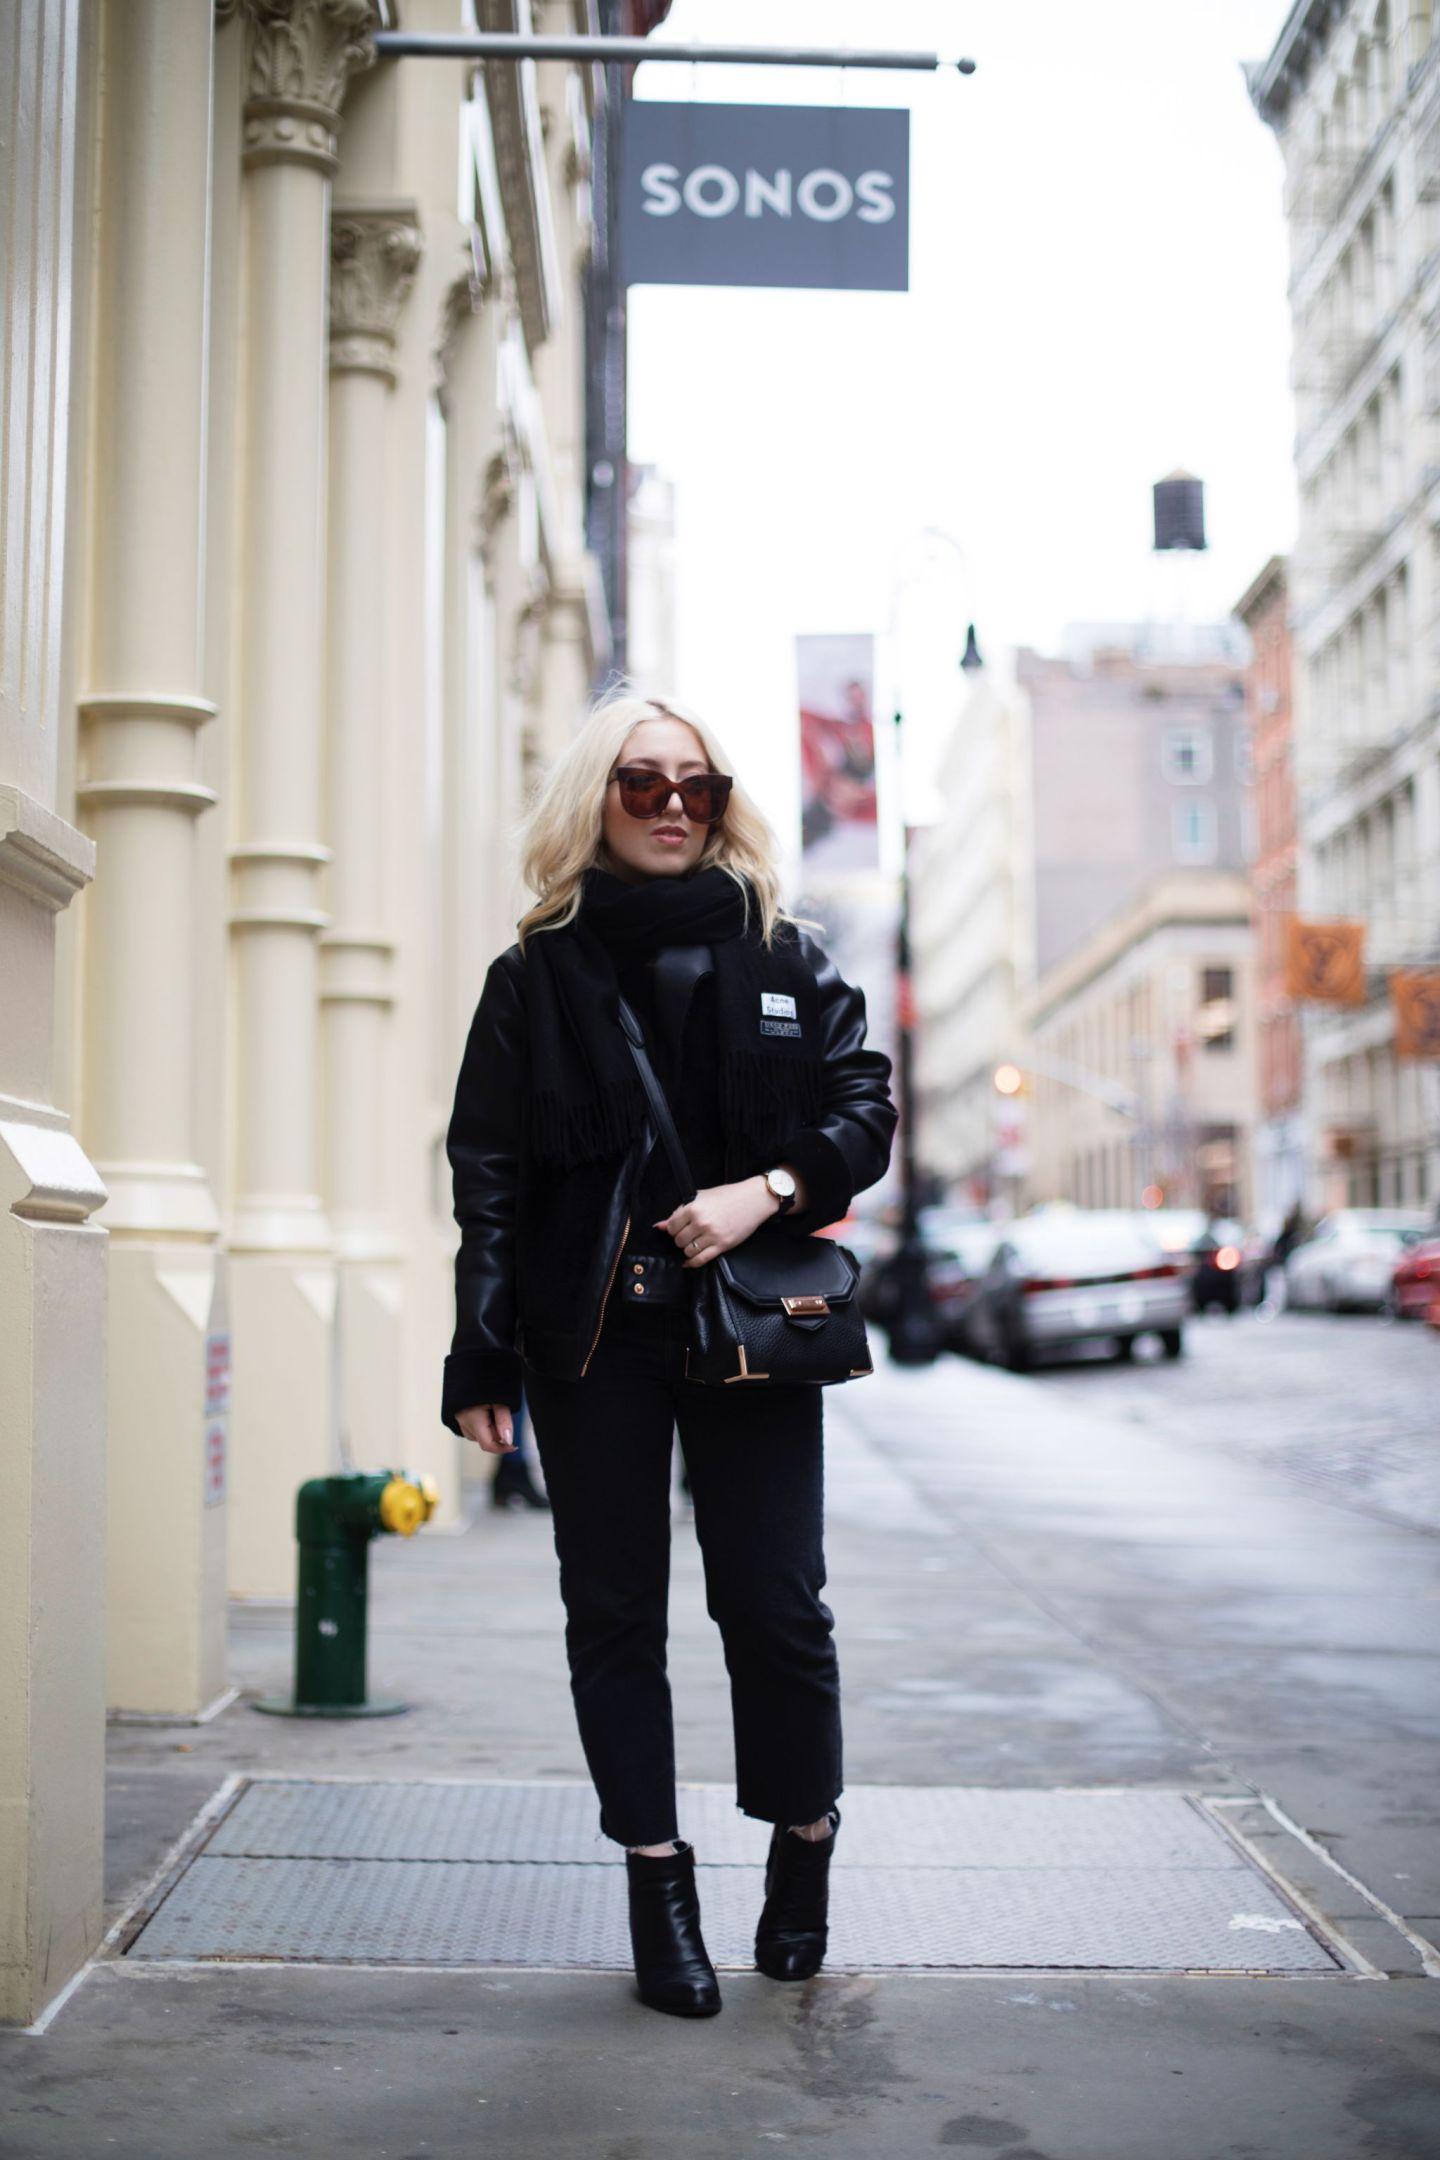 My Favorite Look In New York City #3